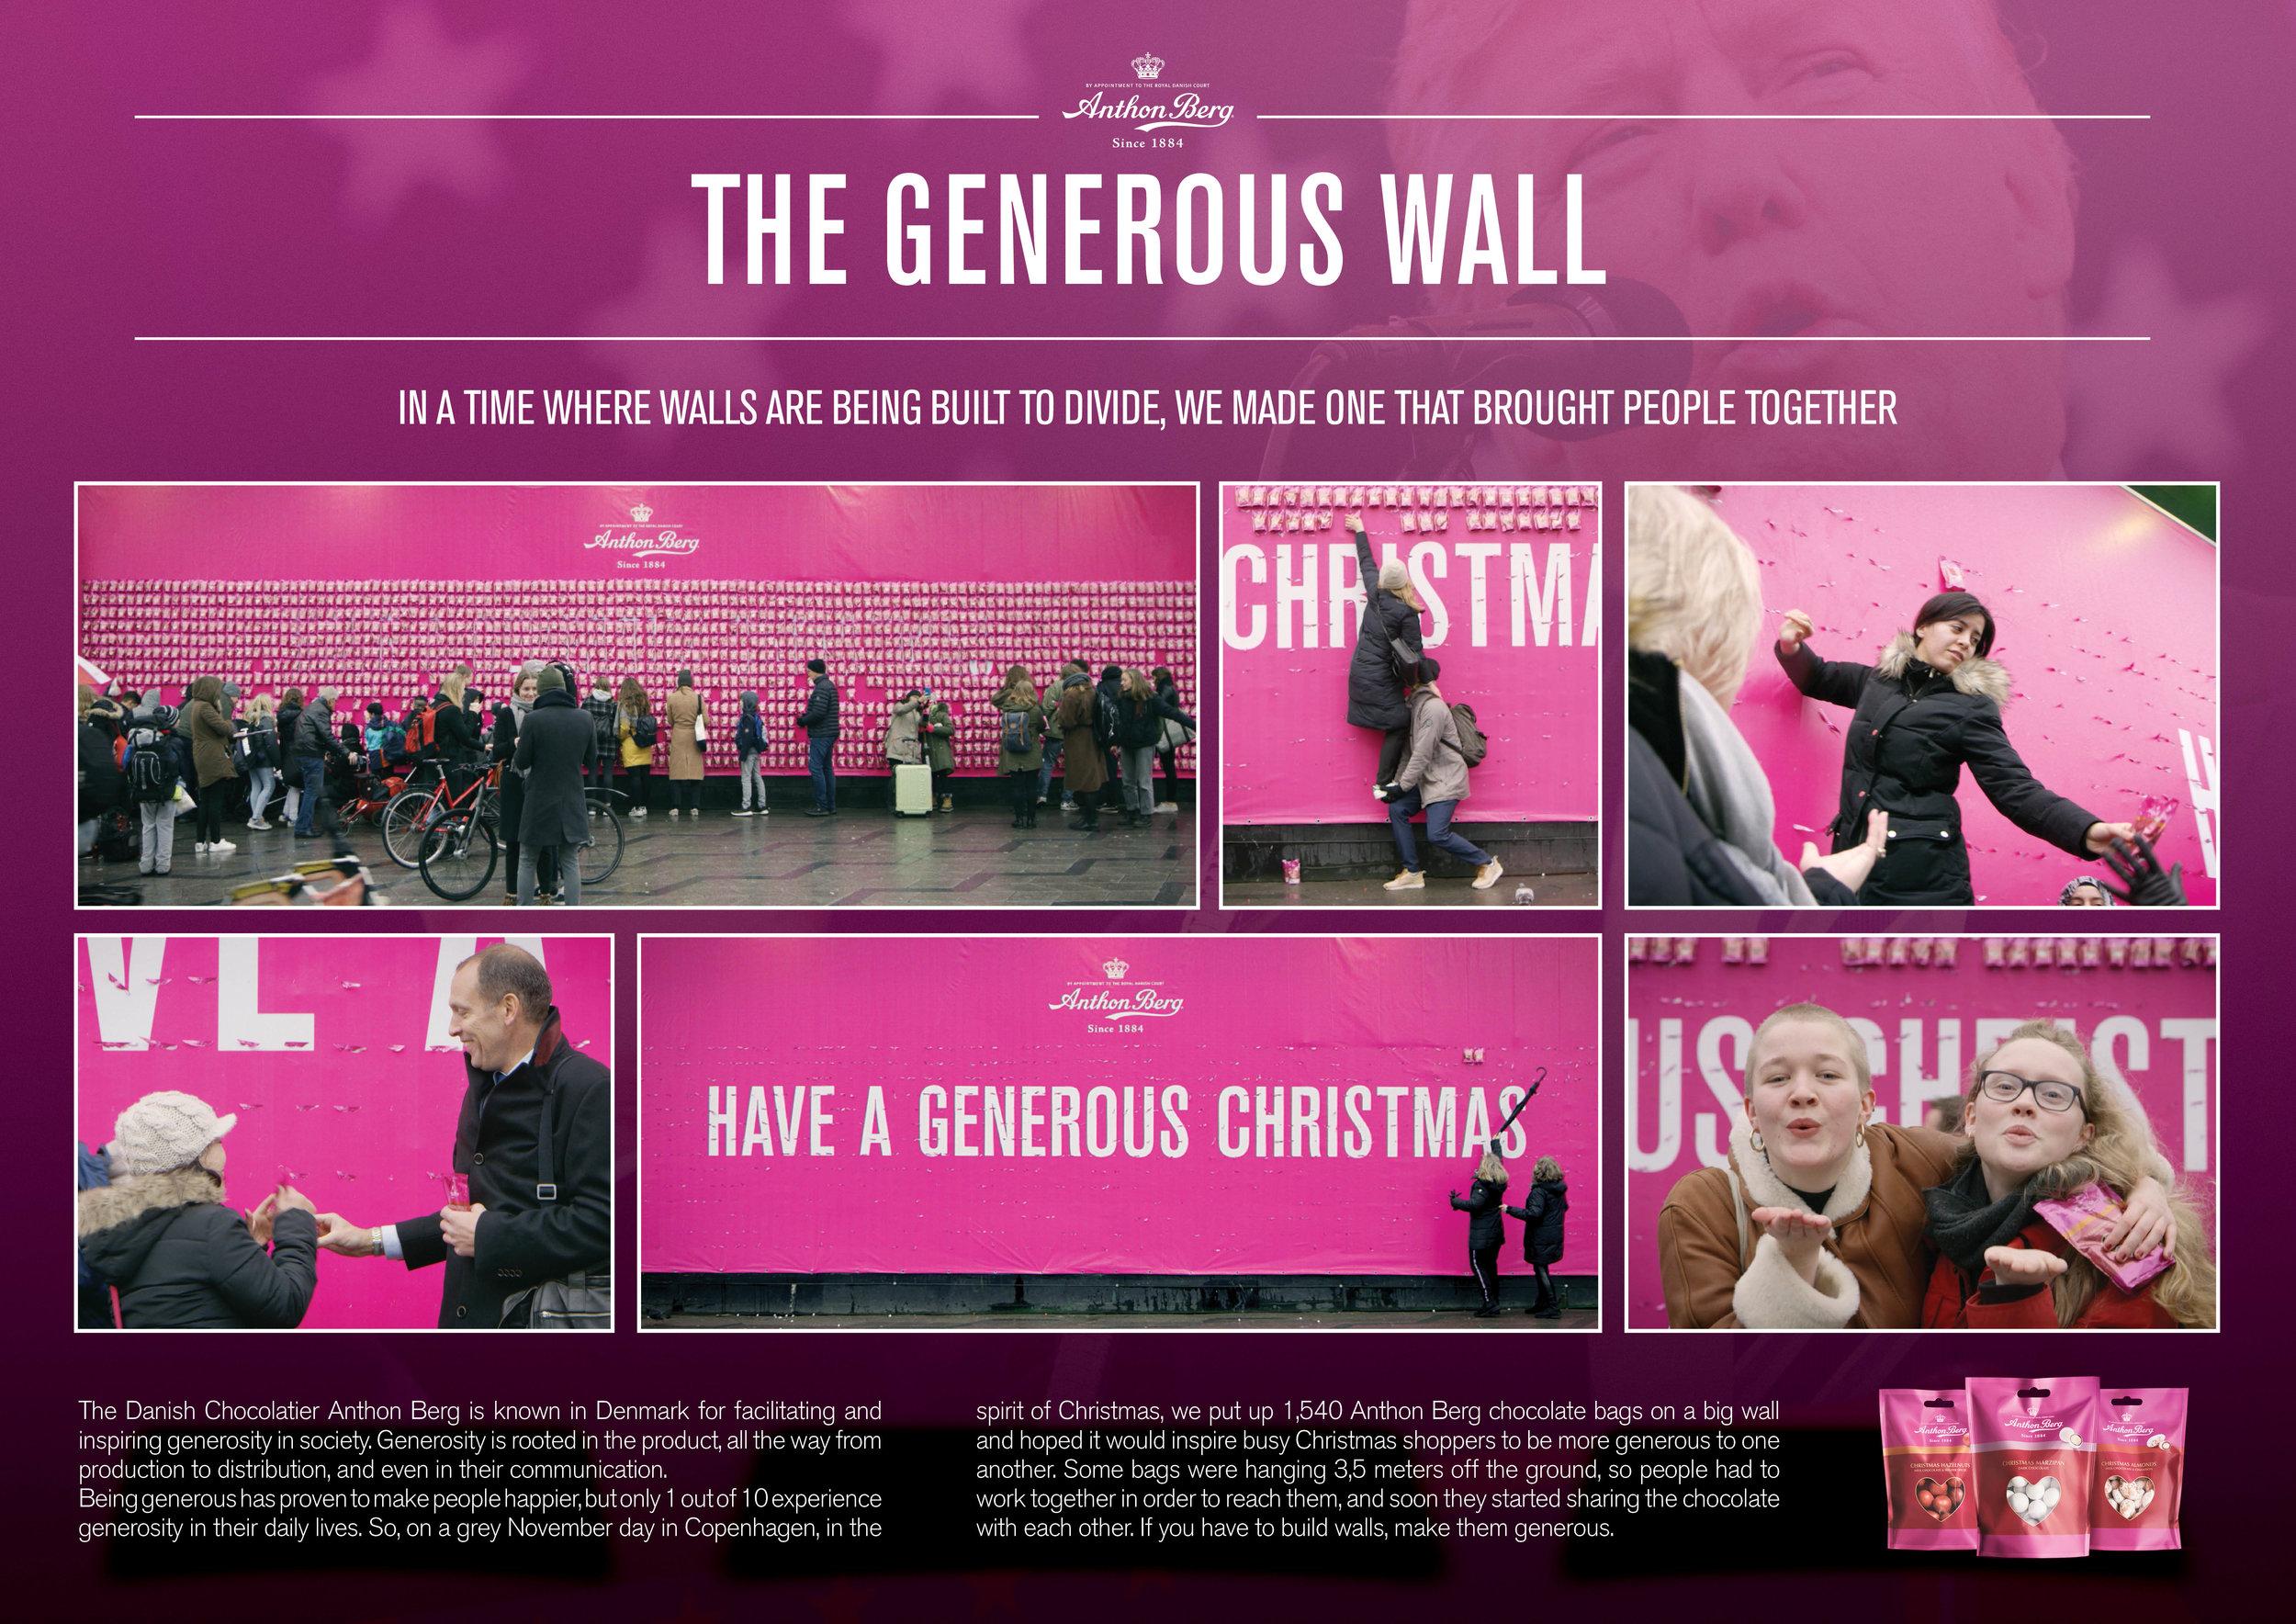 Anthon Berg_The Generous Wall_Board2.jpg